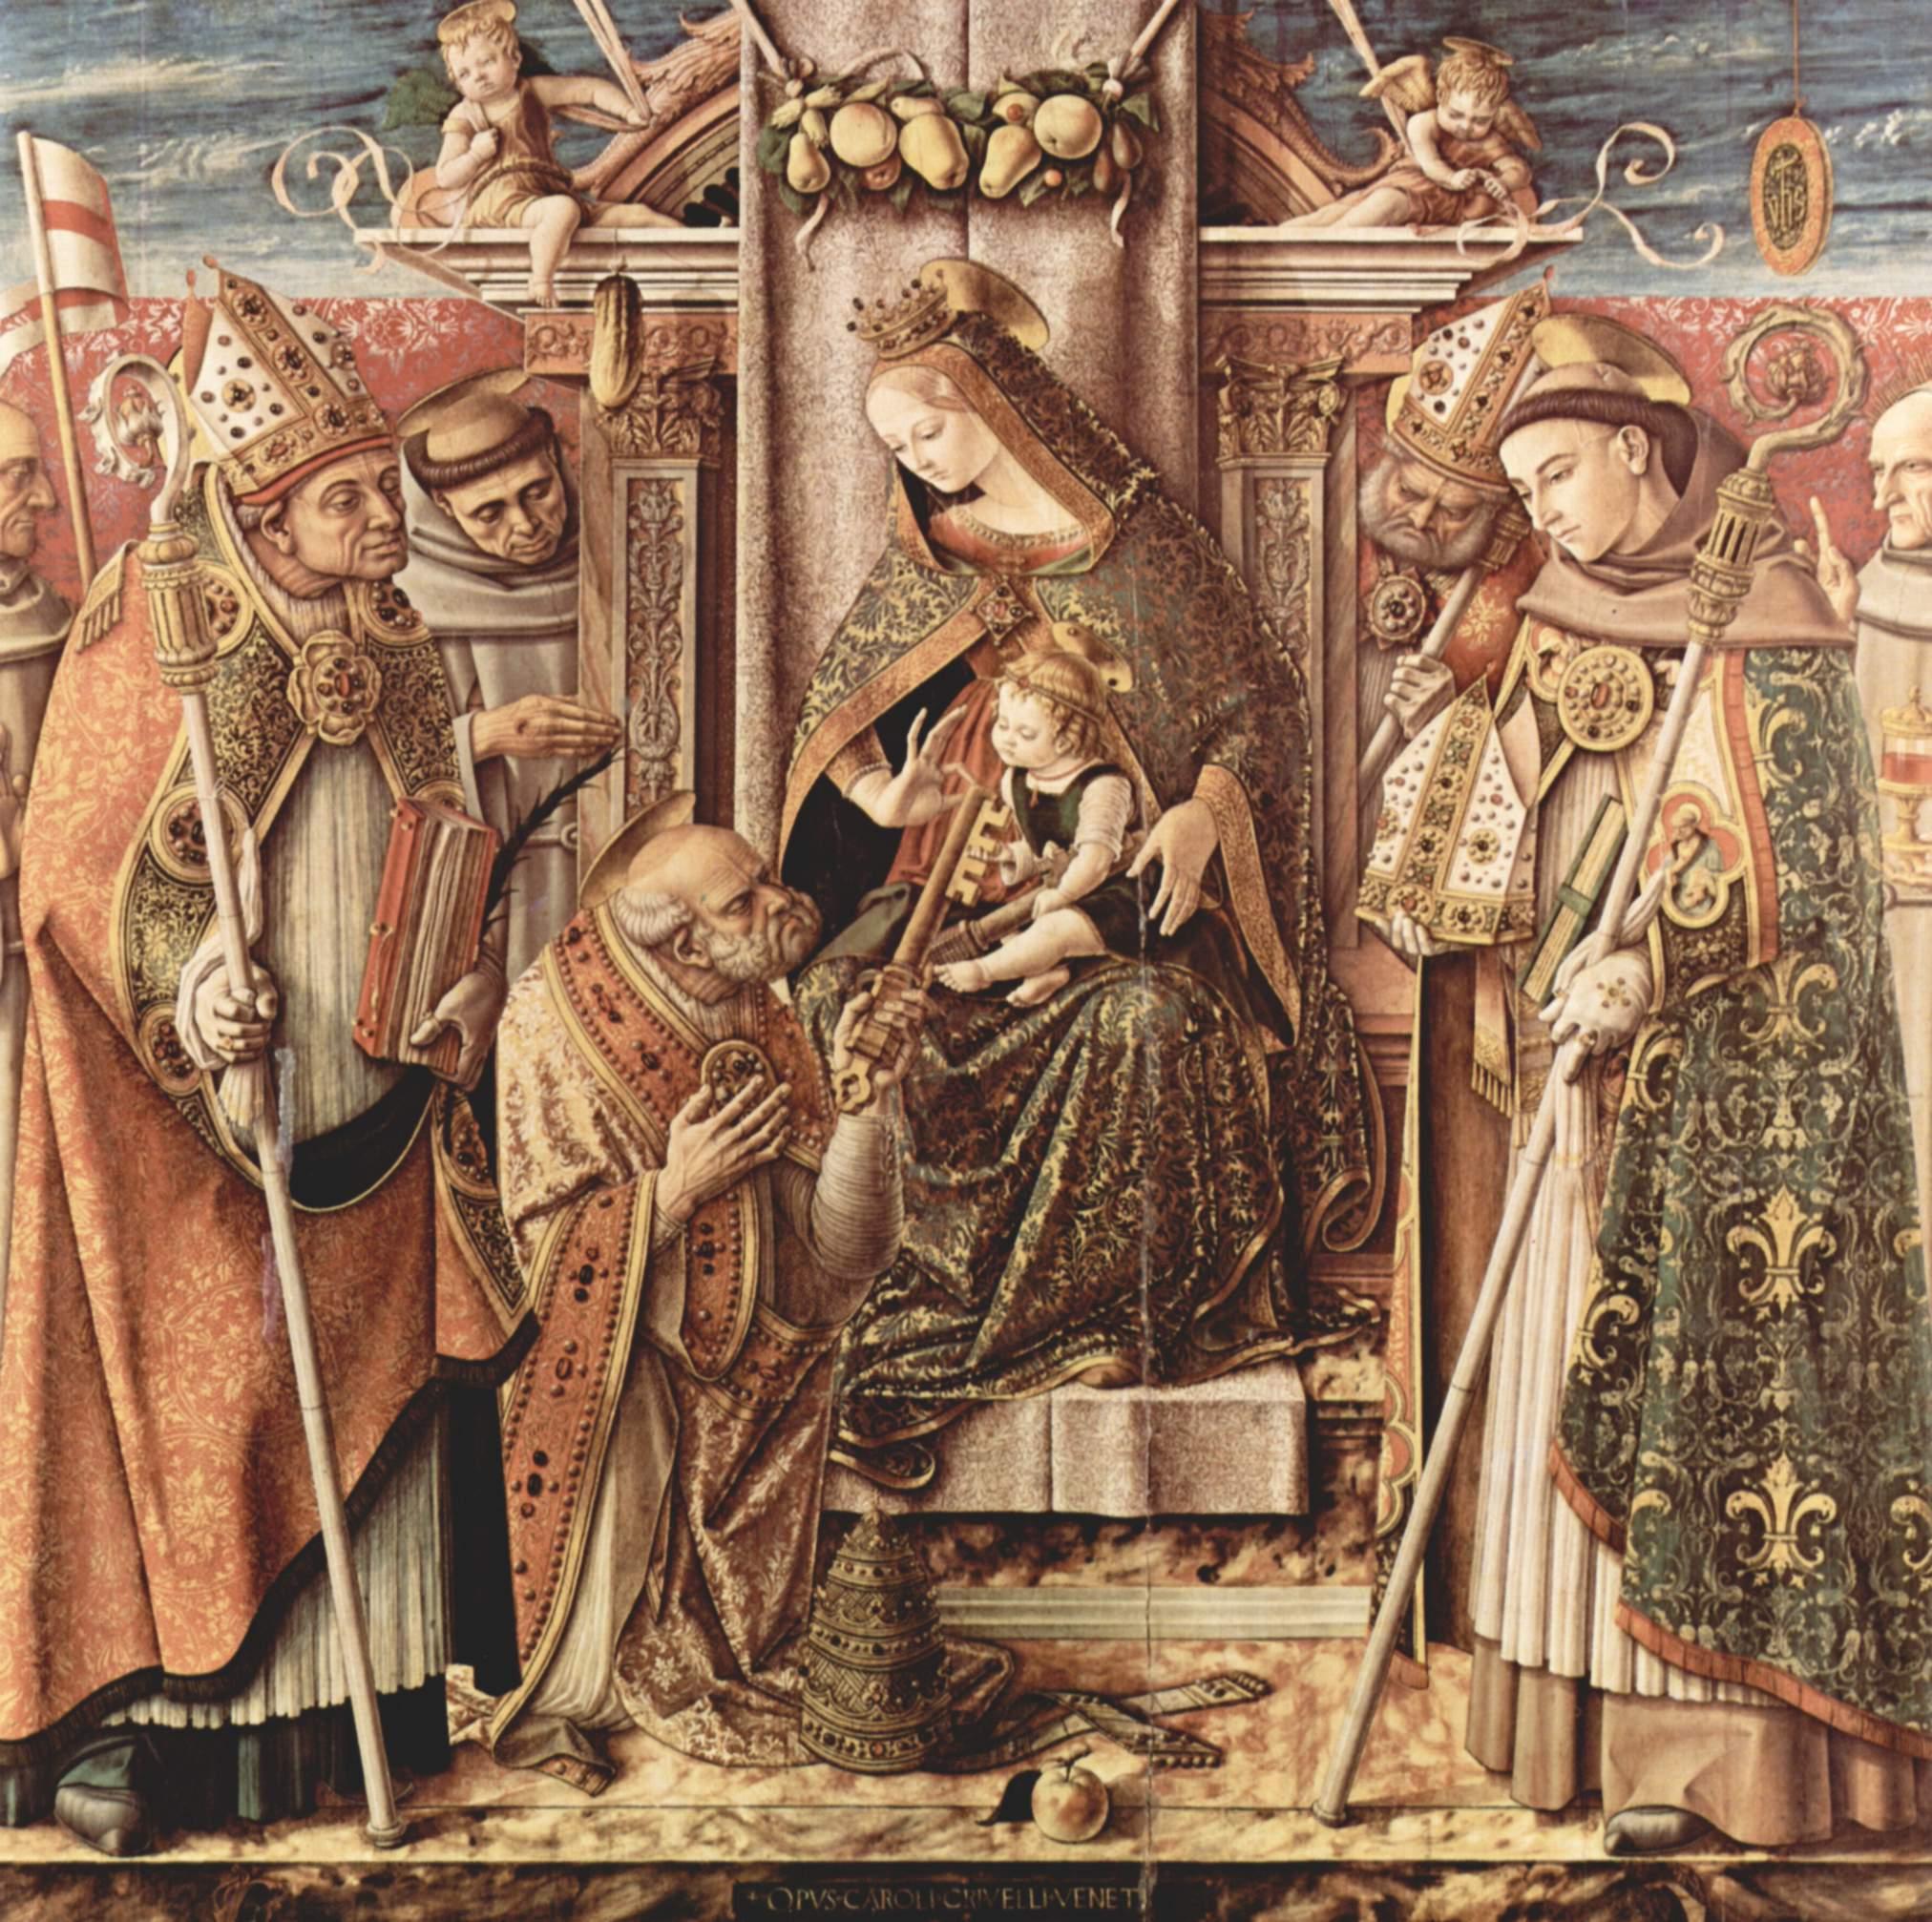 Передача ключей. Мадонна на престоле с младенцем Христом, передающим ключи от рая св. Петру, Карло Кривелли